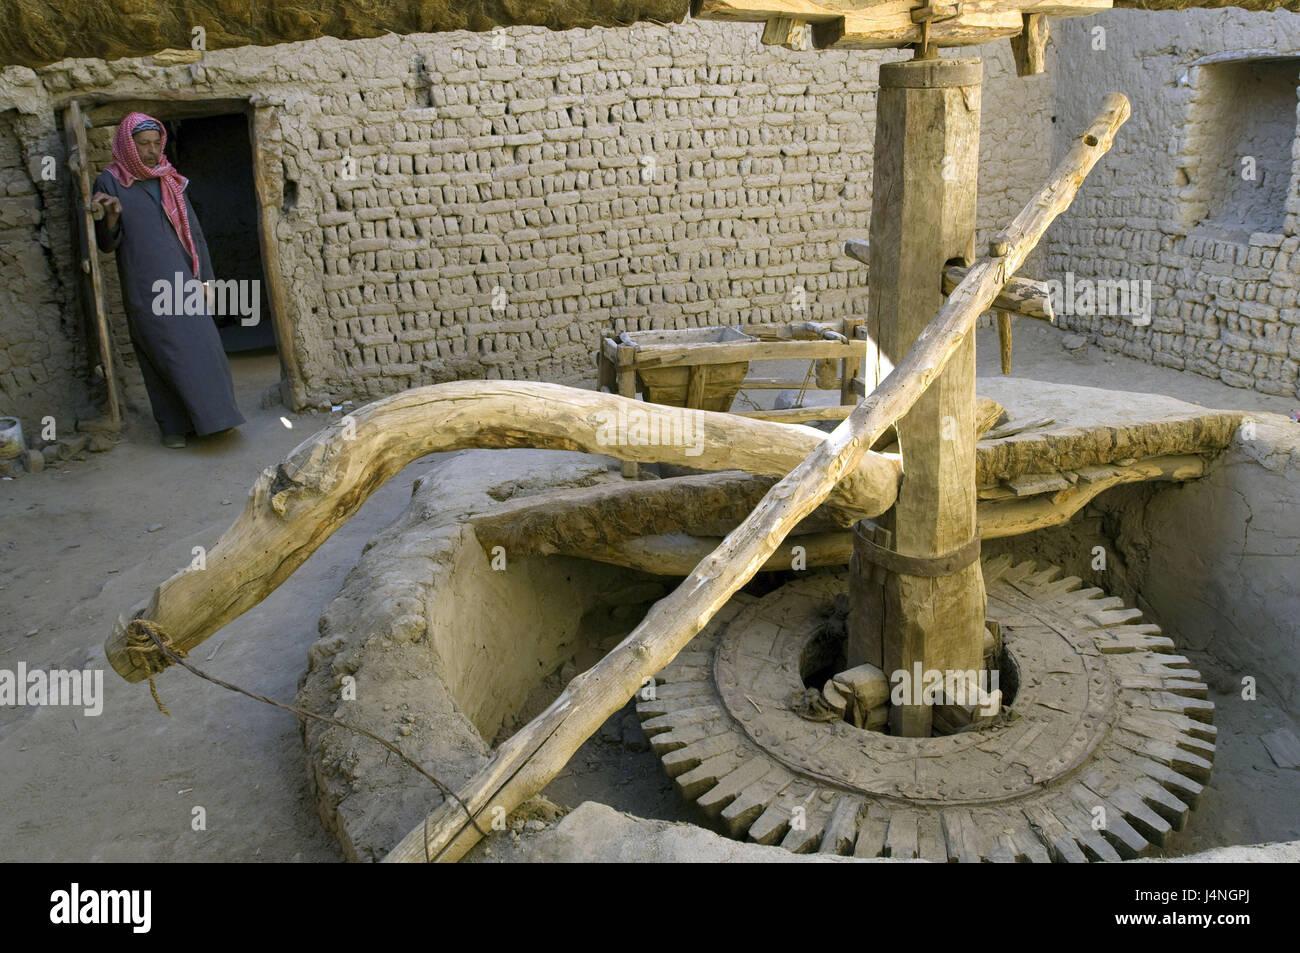 Egypt, desert, Dakhla oasis, El-Qasr, grain mill, Egyptian, no model release, - Stock Image